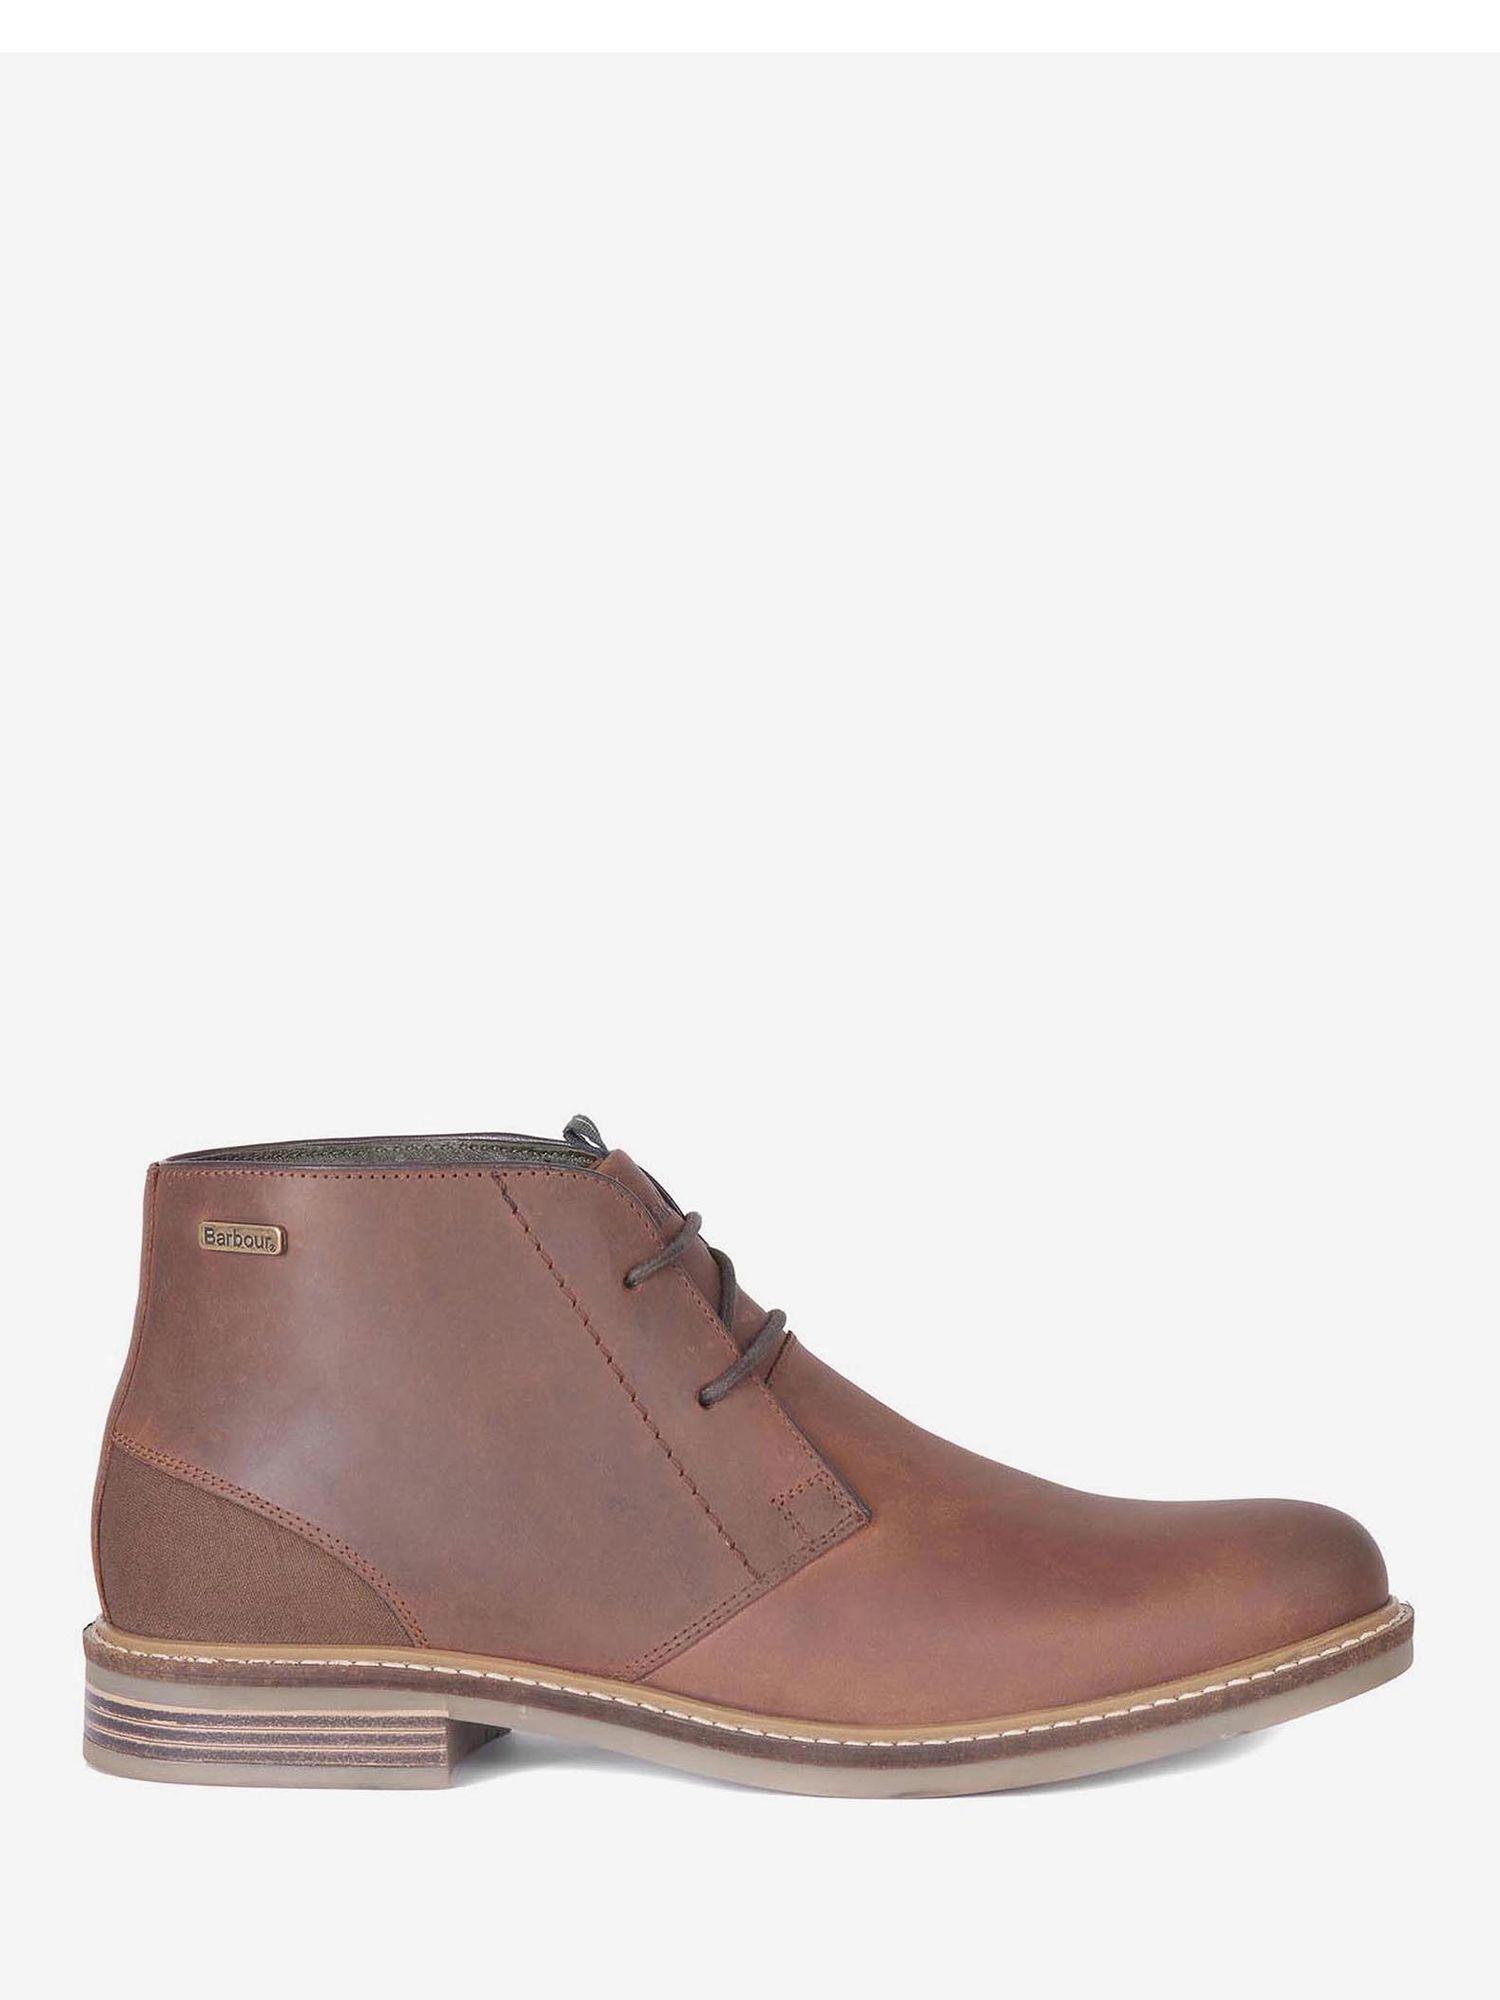 586e9f539d8 Barbour Redhead Leather Chukka Boots, Dark Tan